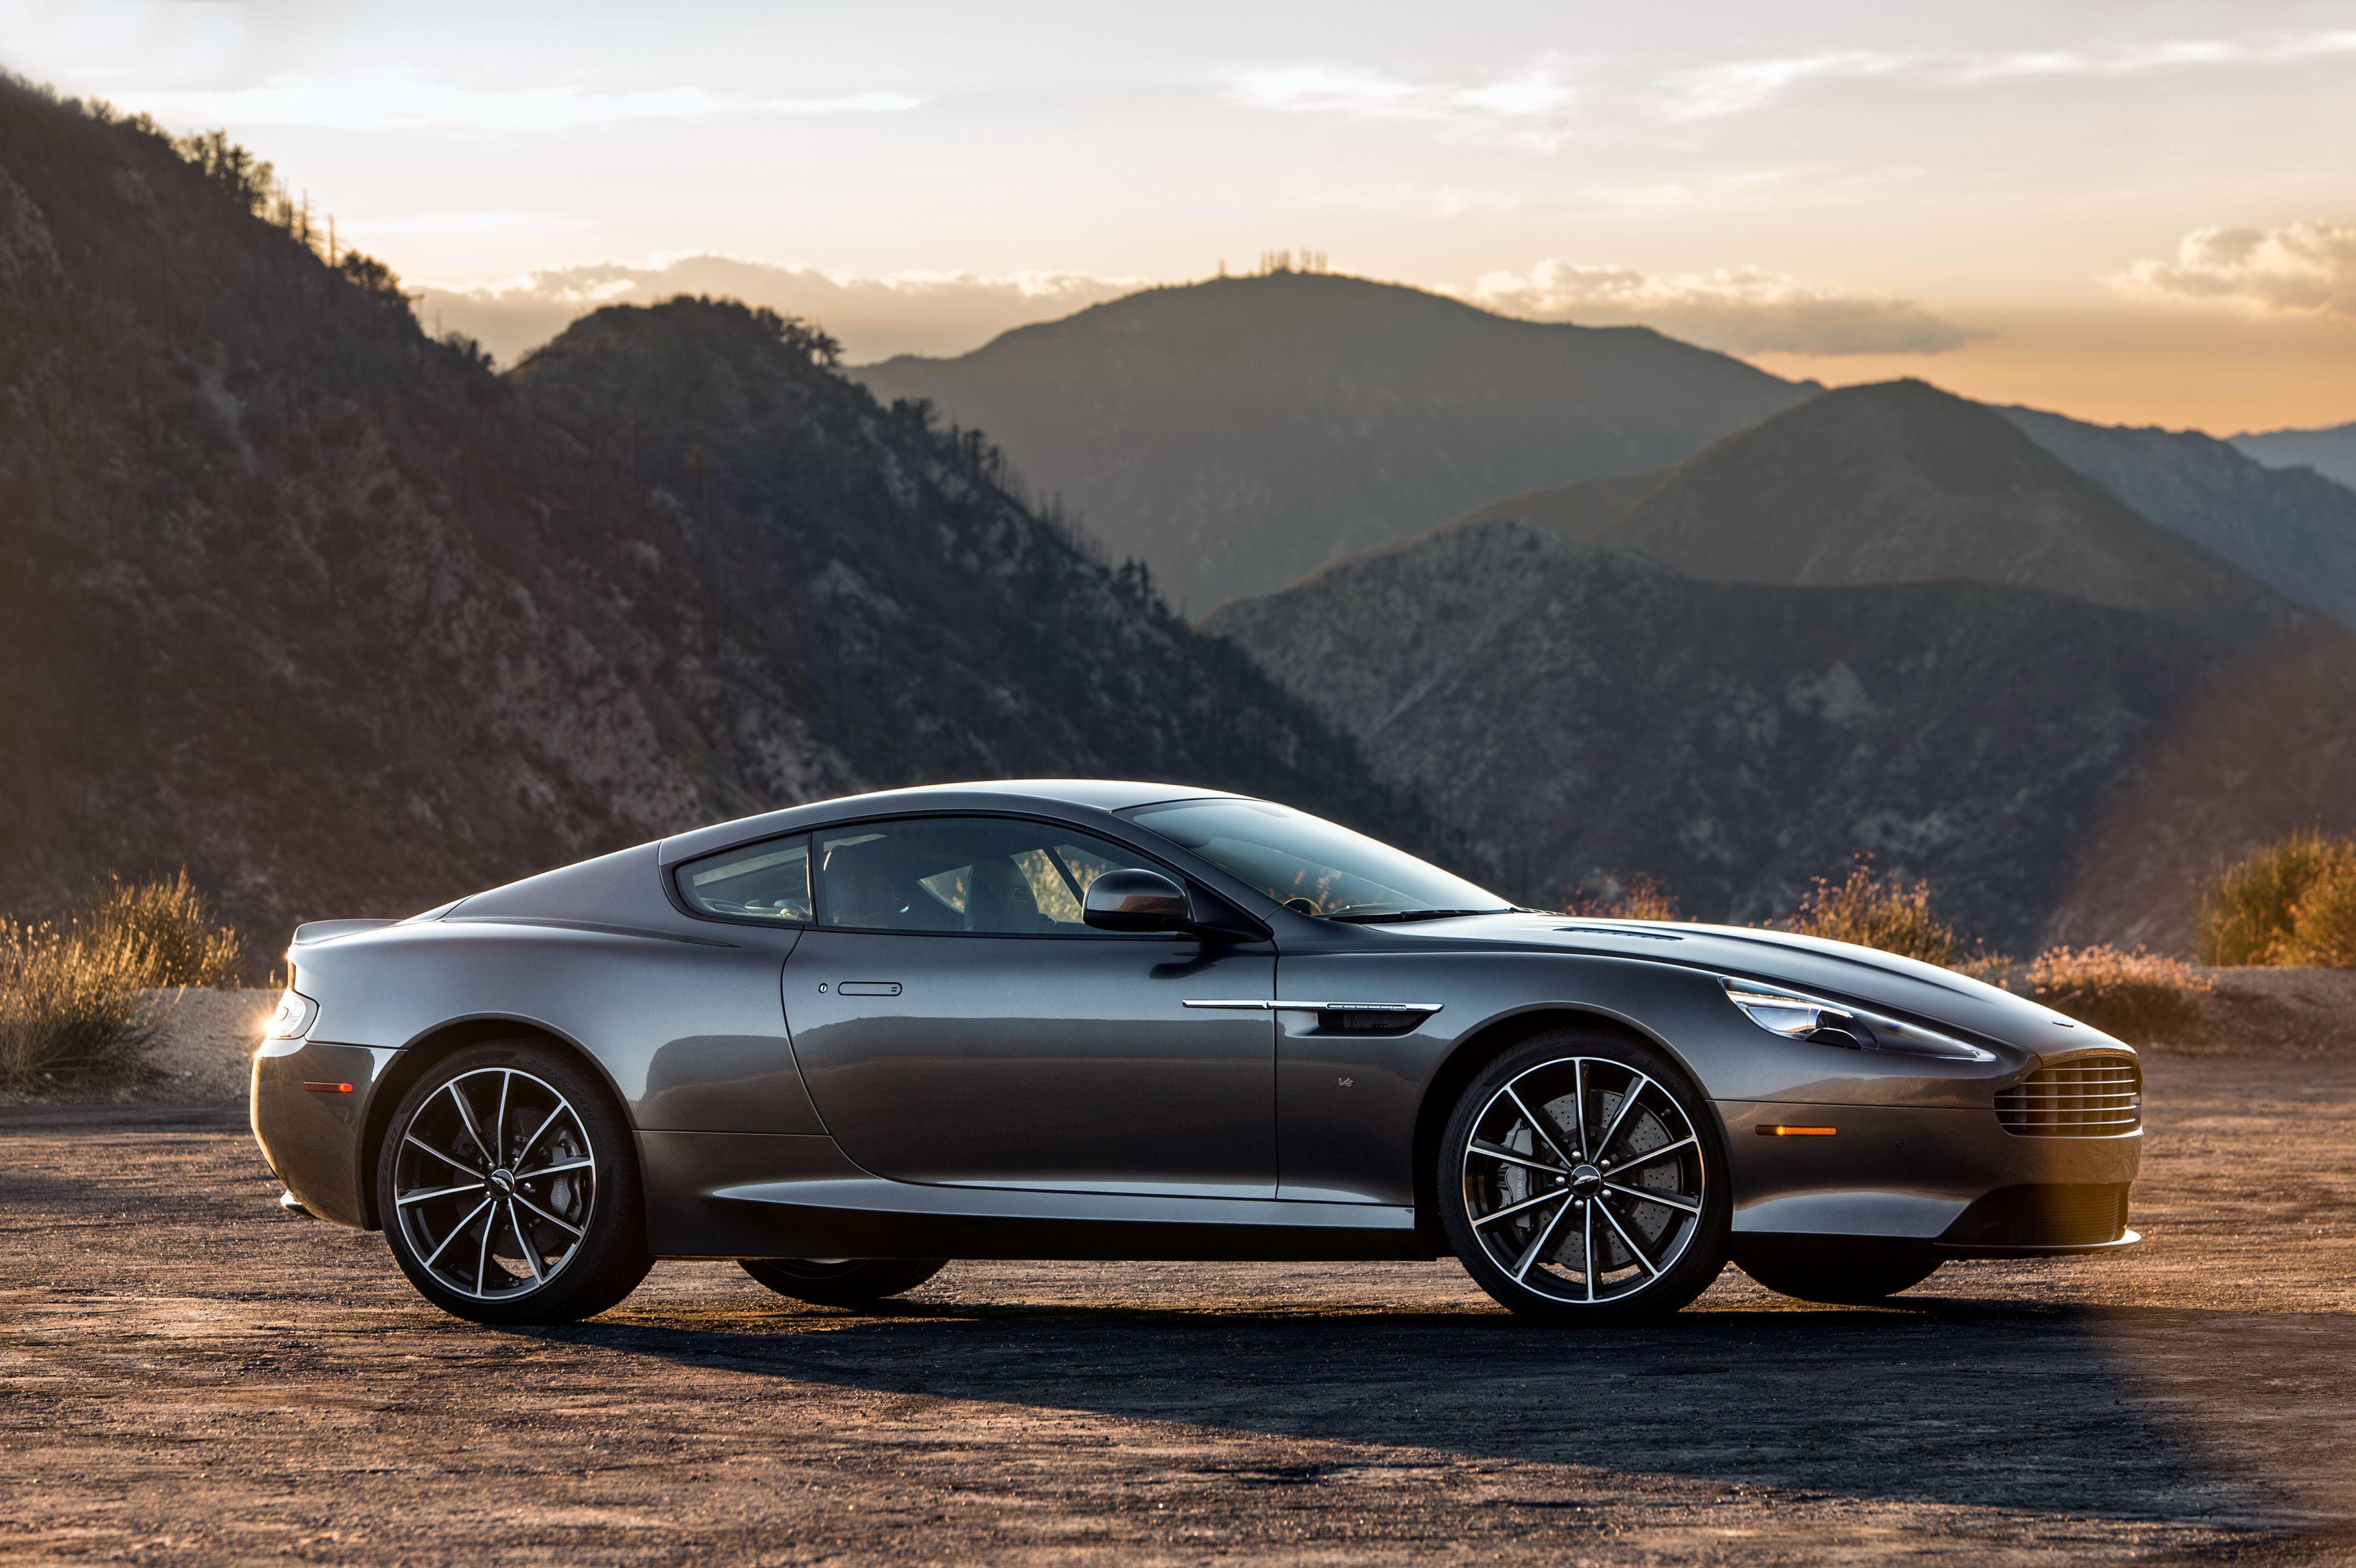 Aston Martin Db9 Wallpapers Top Free Aston Martin Db9 Backgrounds Wallpaperaccess